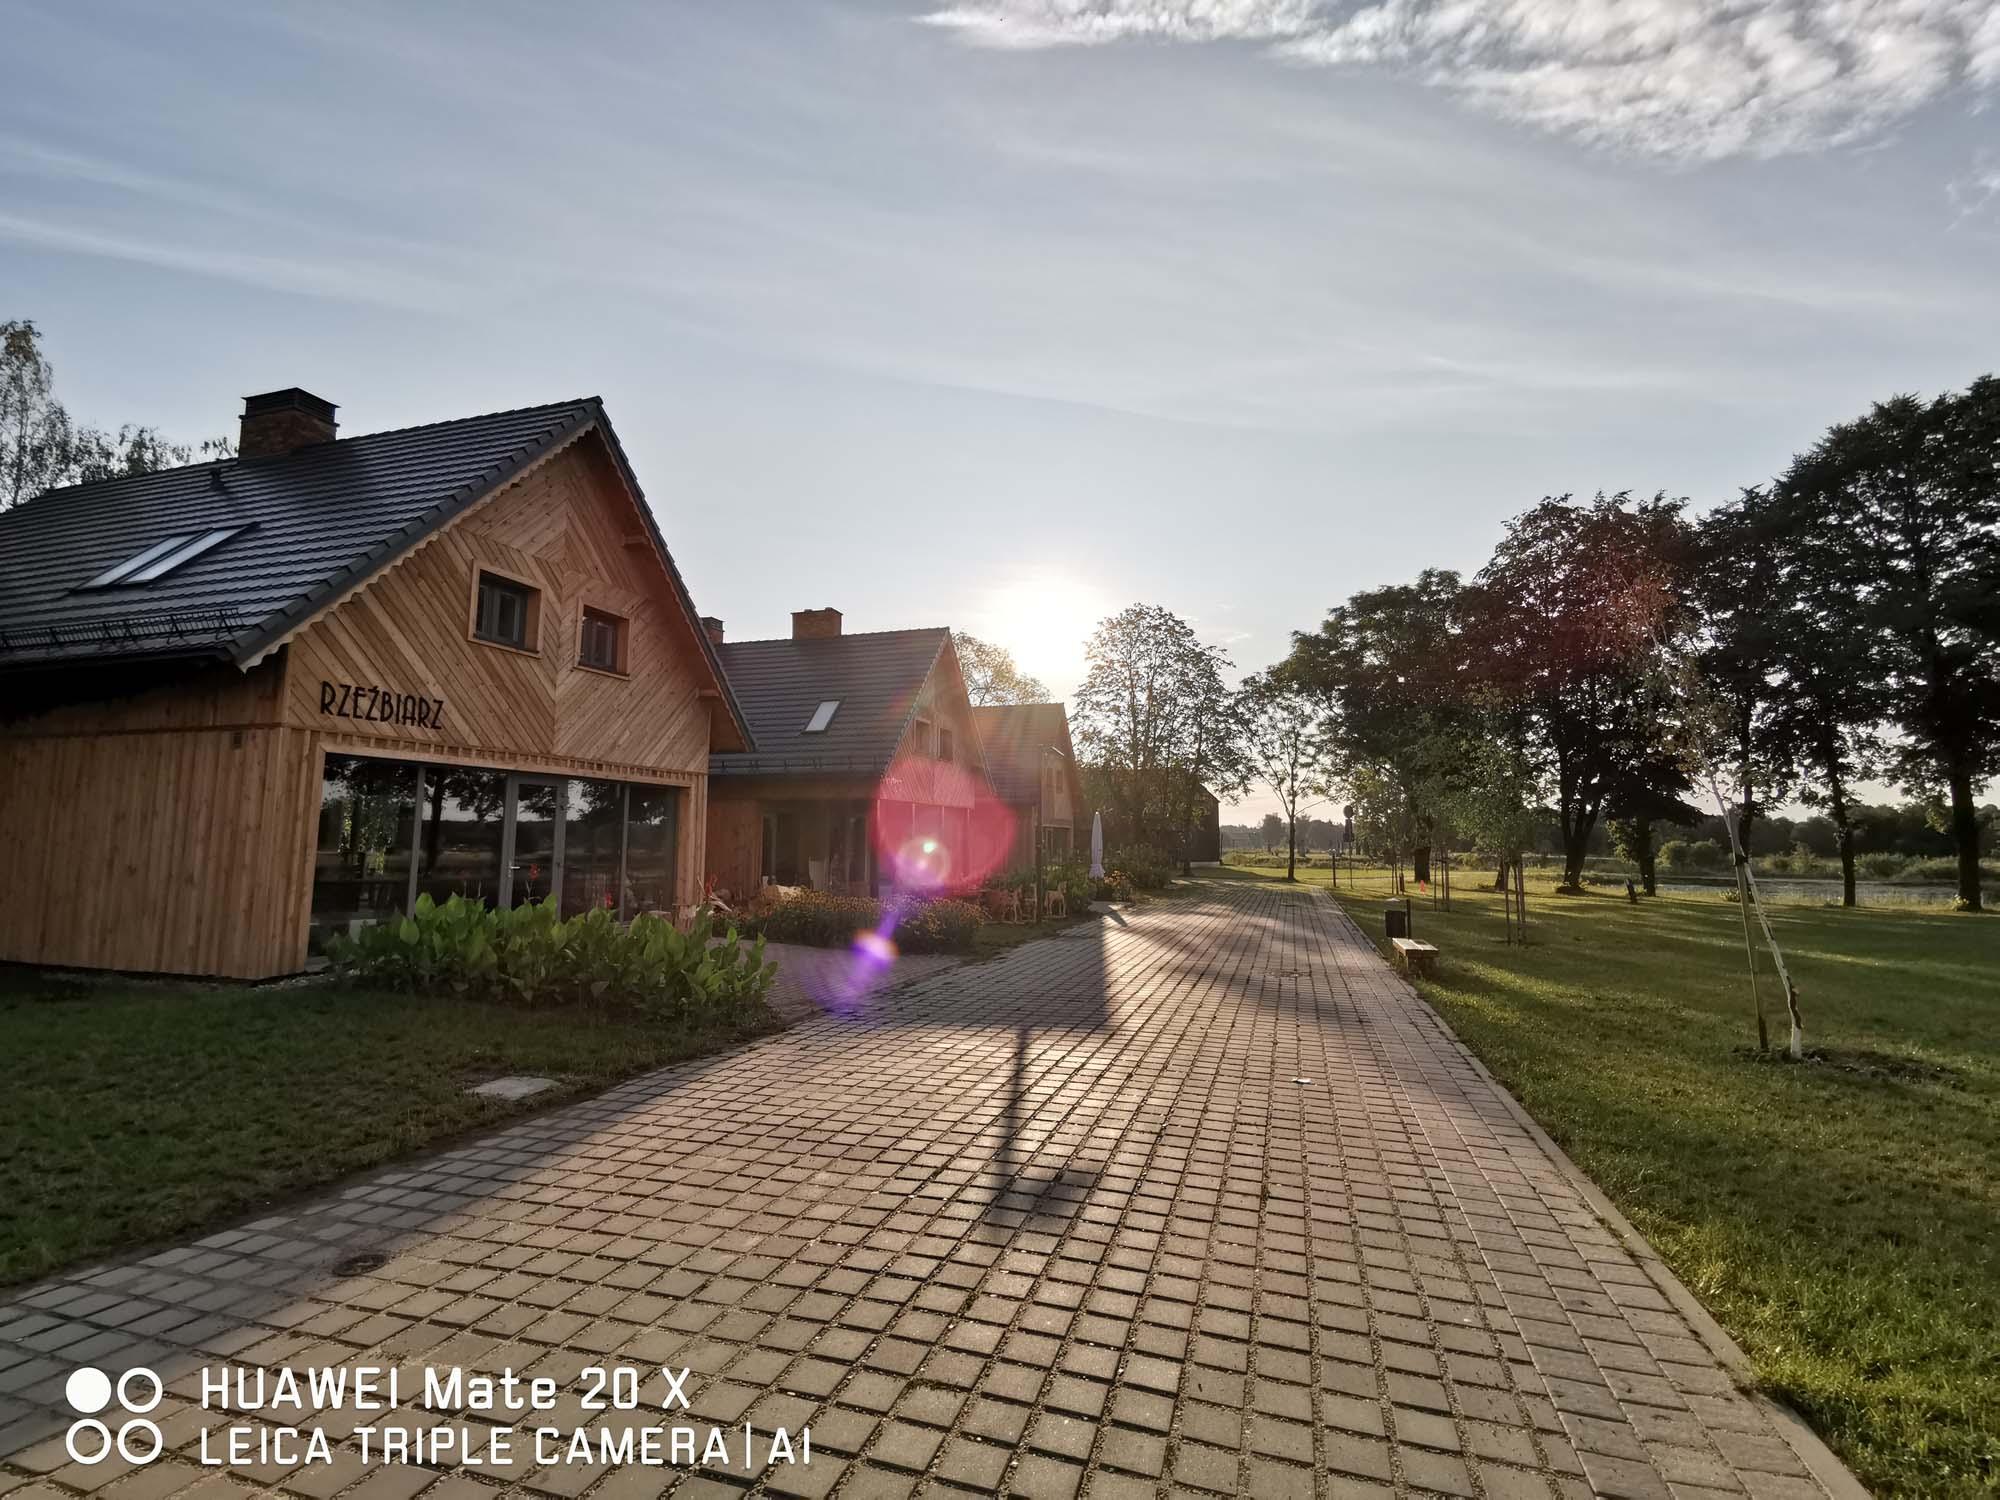 Zdjęcia z Huawei Mate 20 X 5G